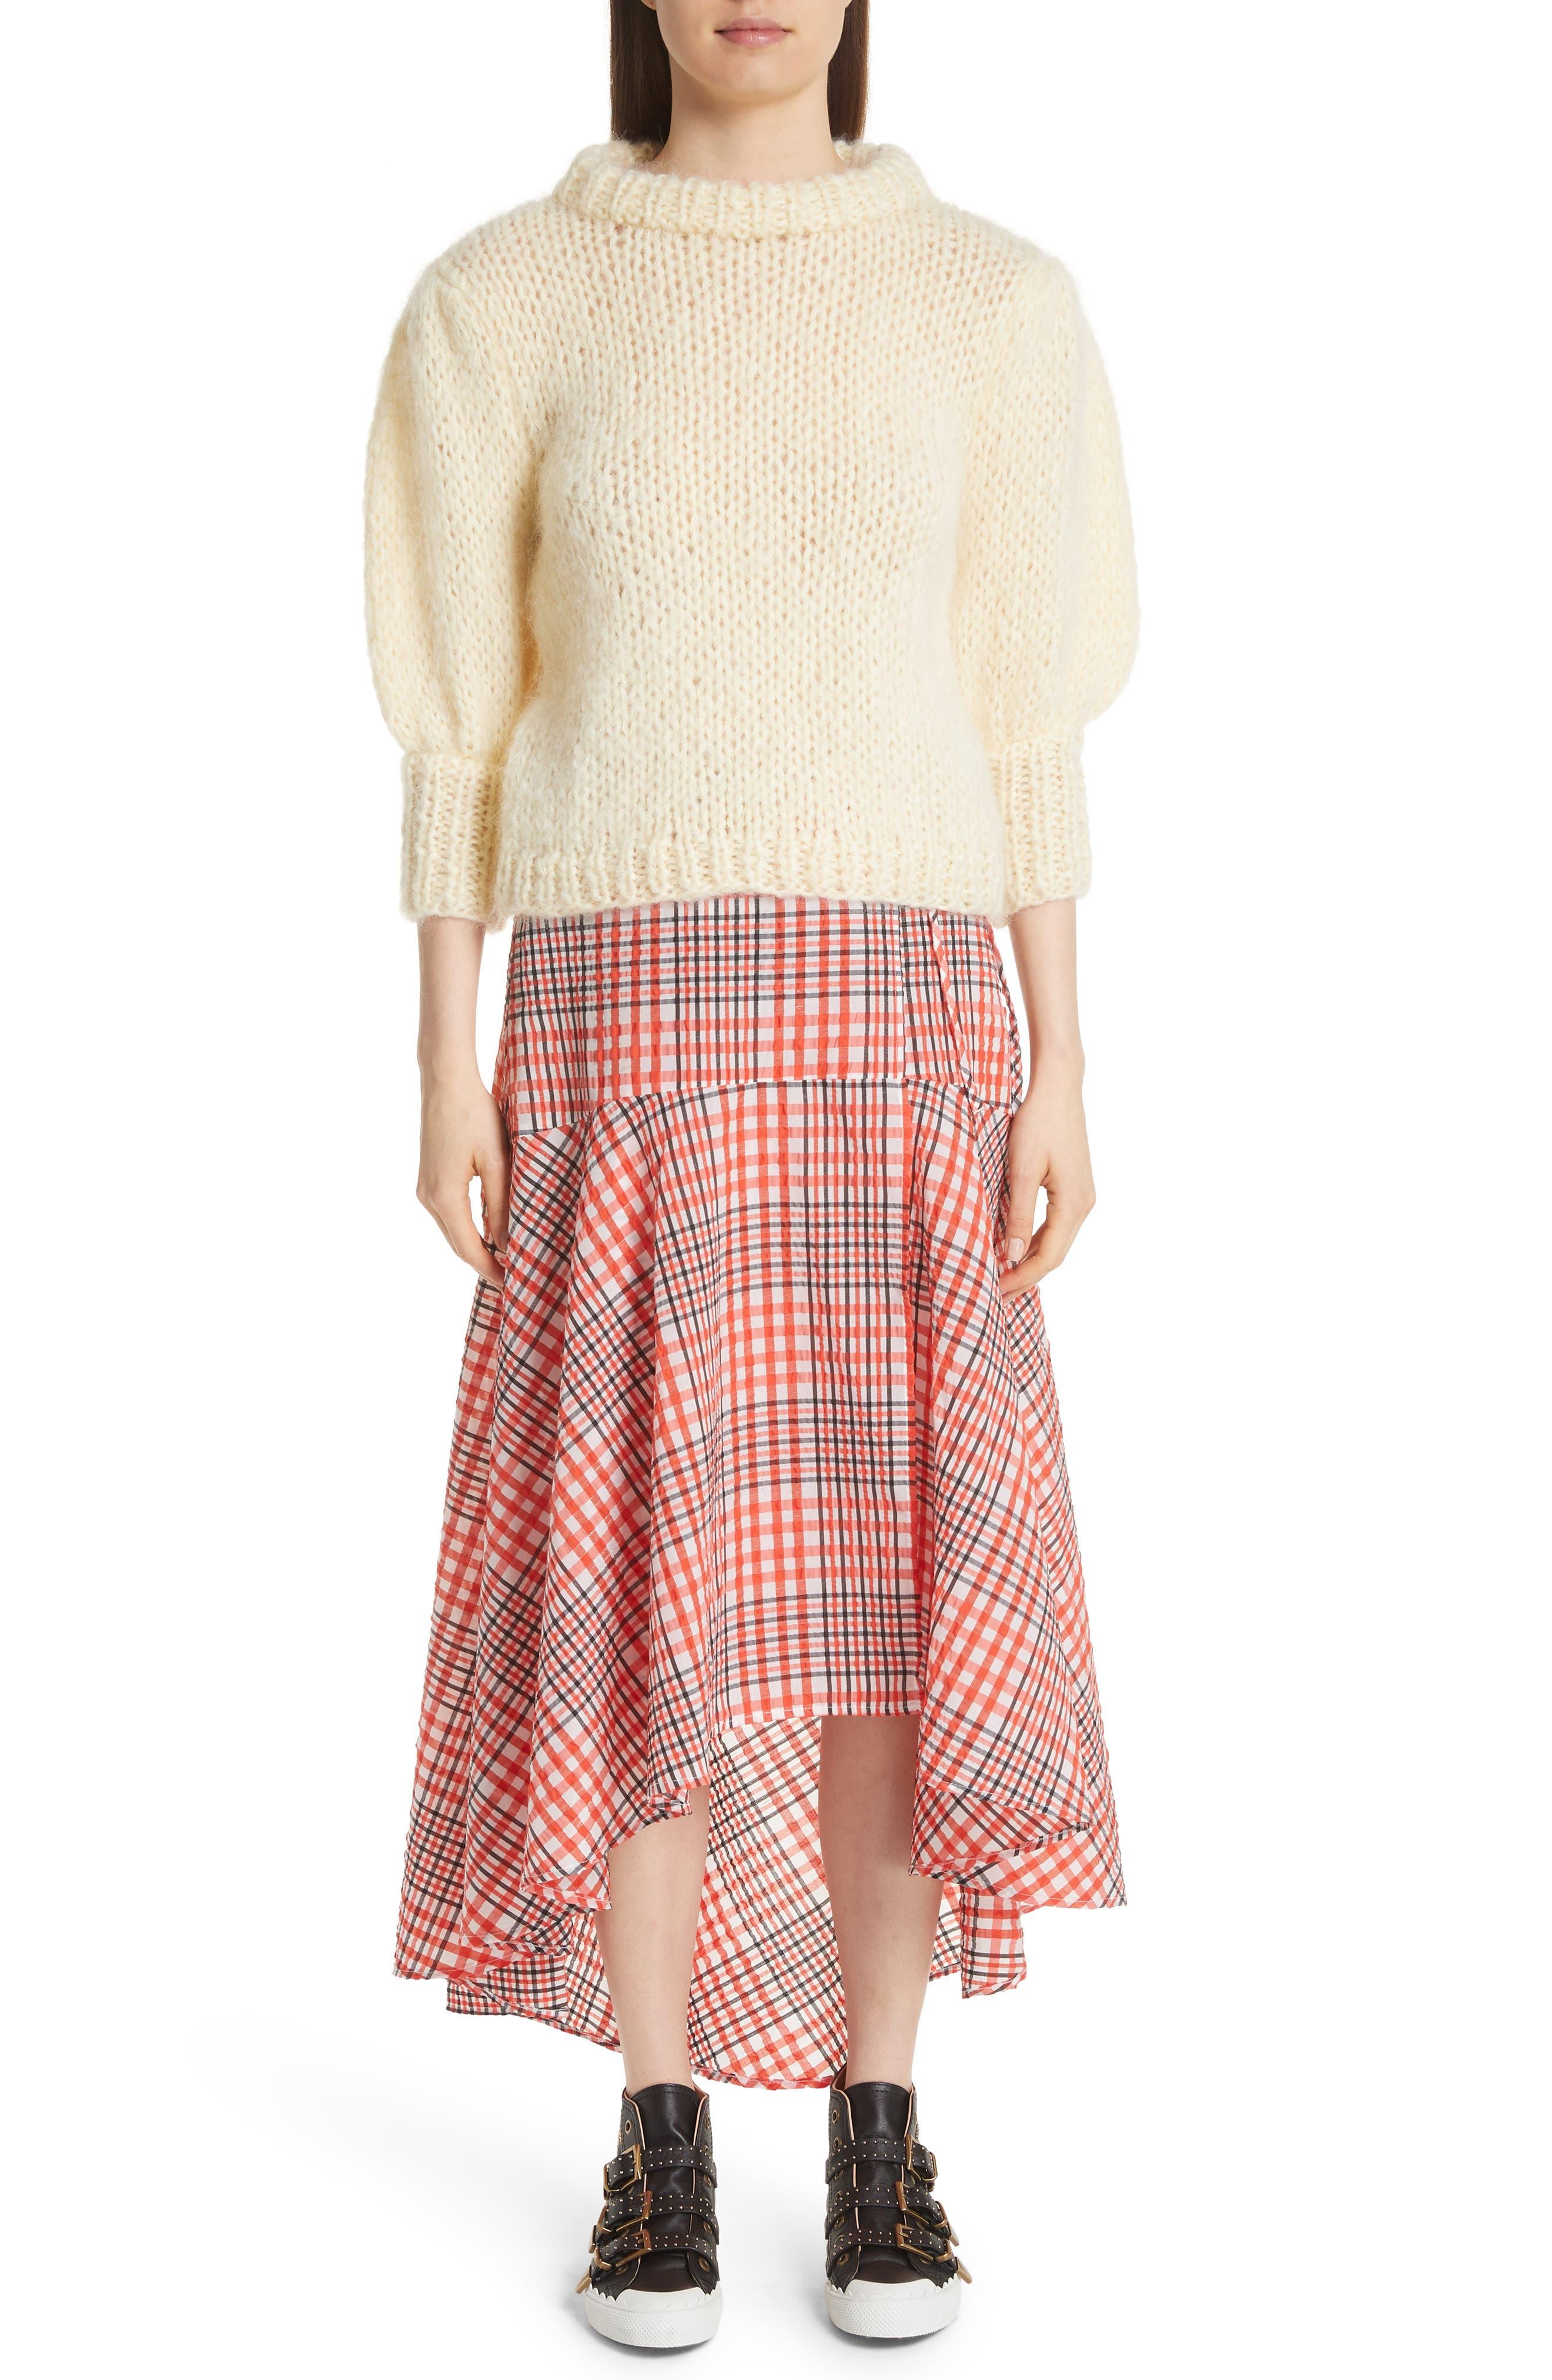 Juilliard Mohair & Wool Puff Sleeve Sweater,                             Alternate thumbnail 7, color,                             900